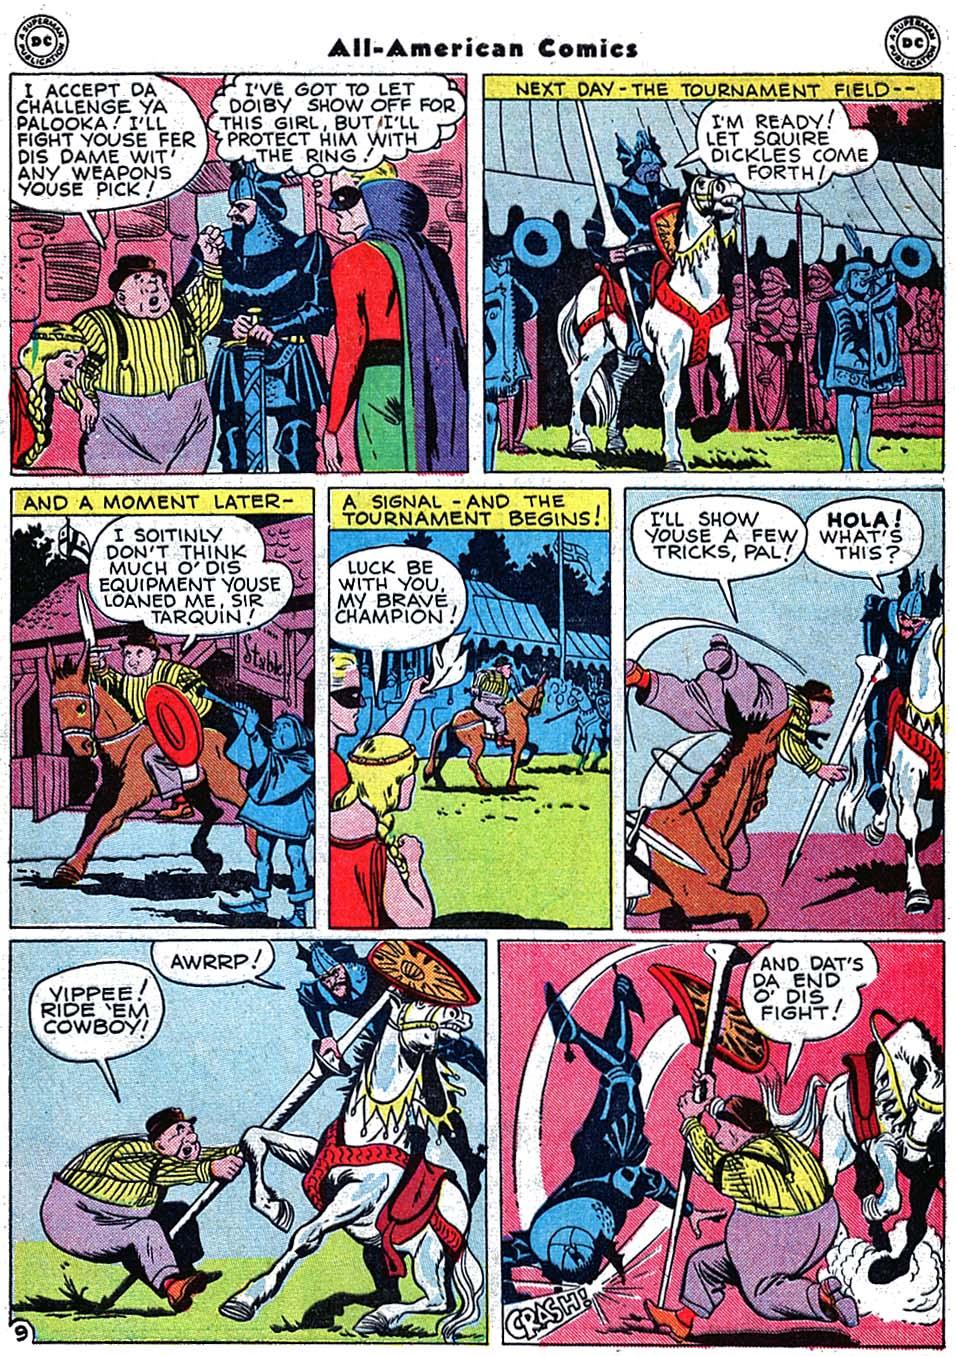 Read online All-American Comics (1939) comic -  Issue #72 - 11